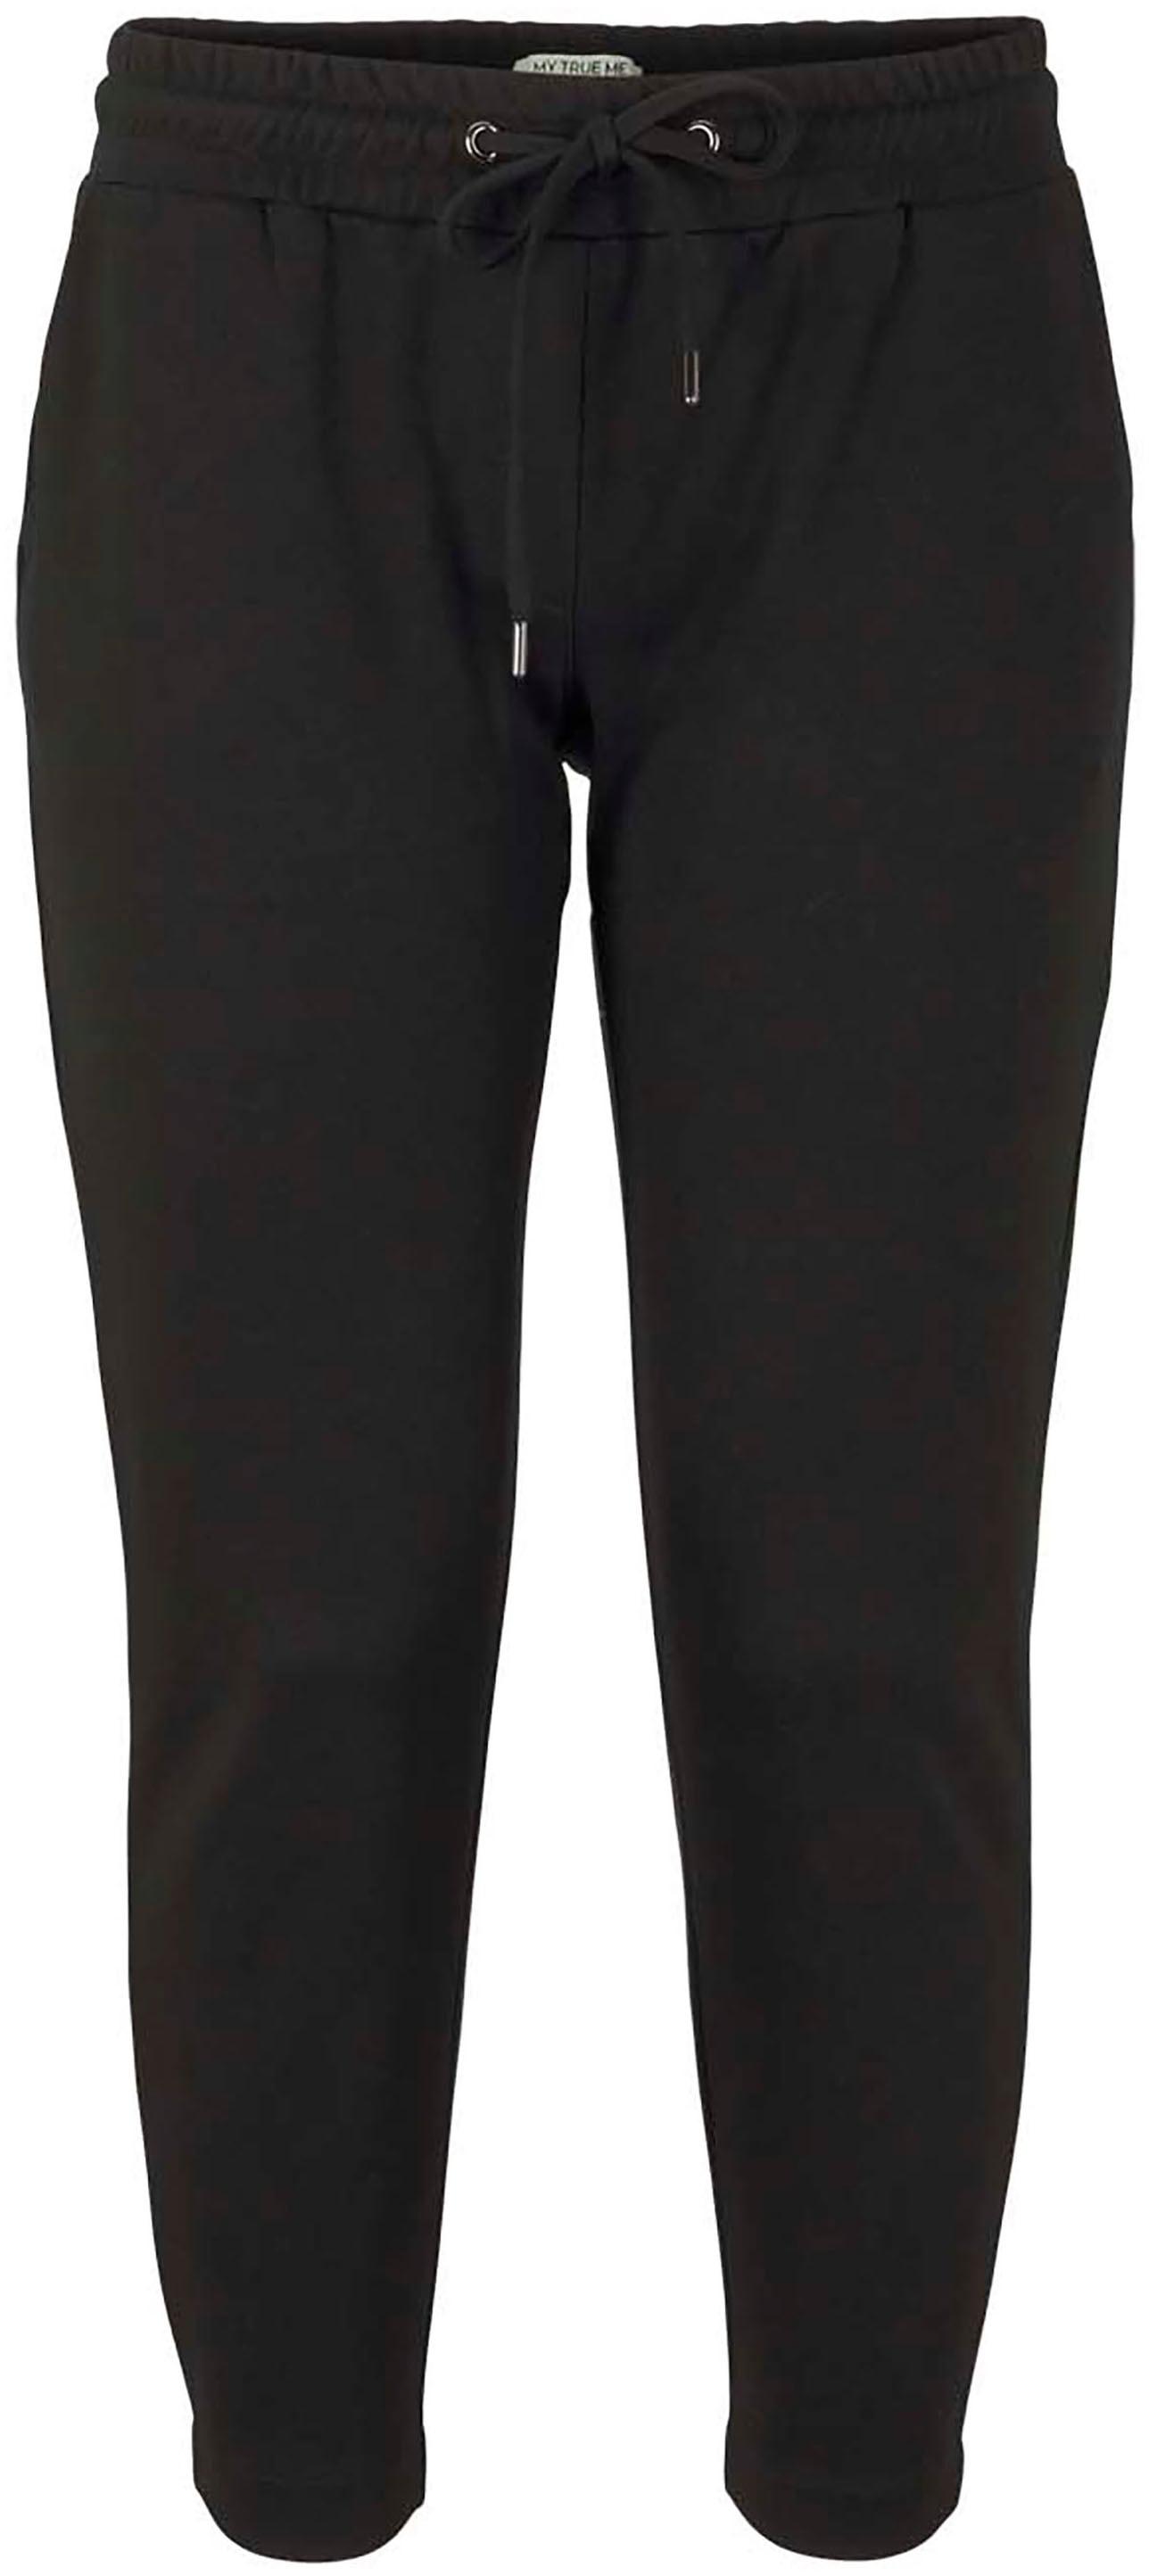 tom tailor my true me -  Jogger Pants, mit elastischem Gummibund